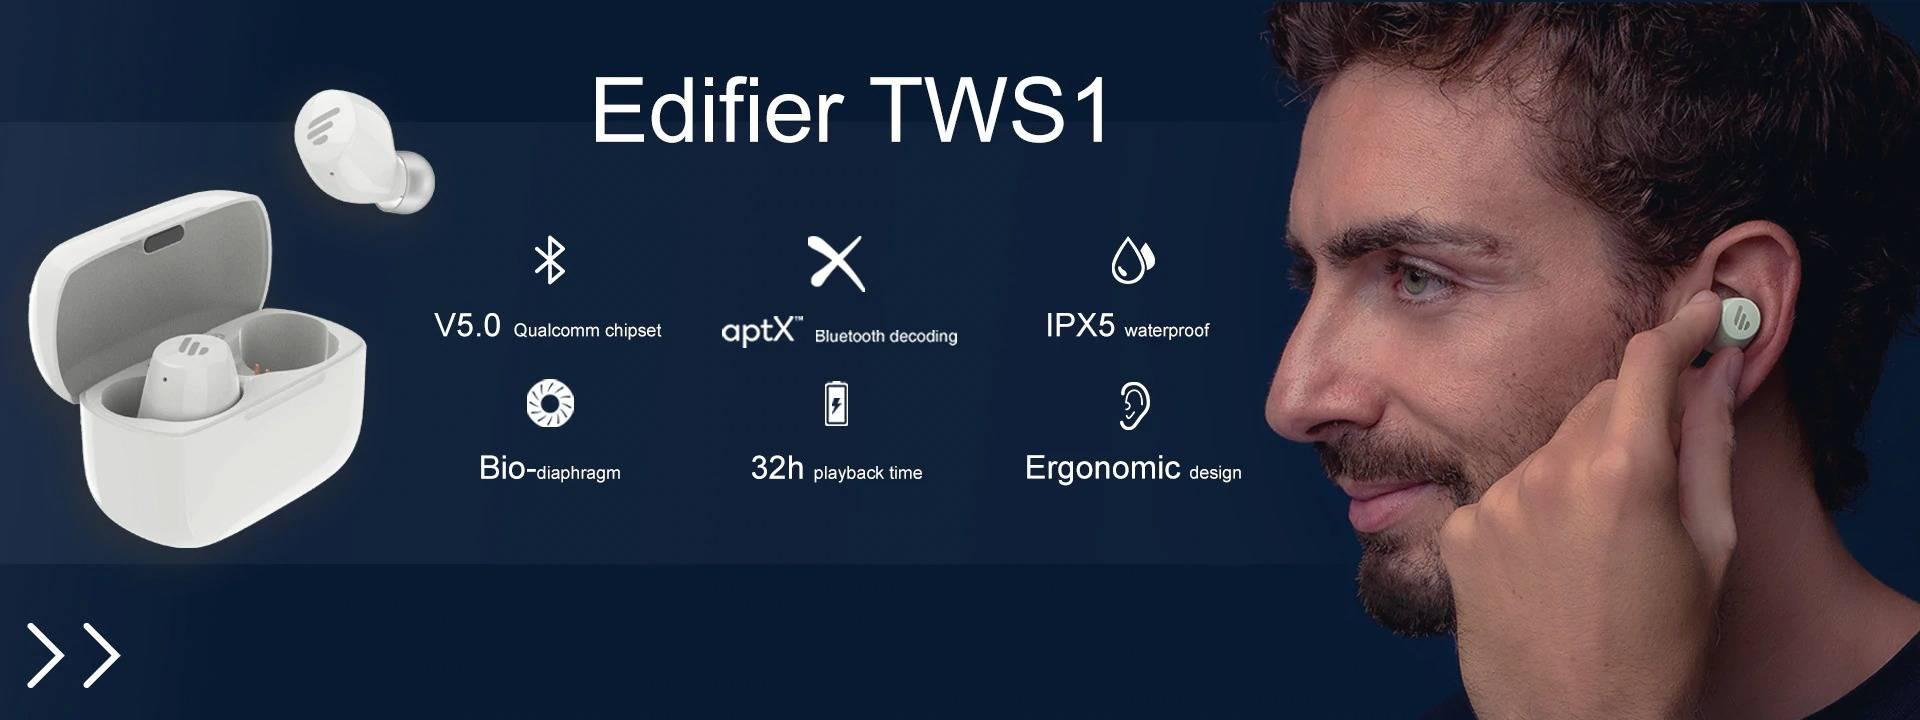 Edifier TWS 1